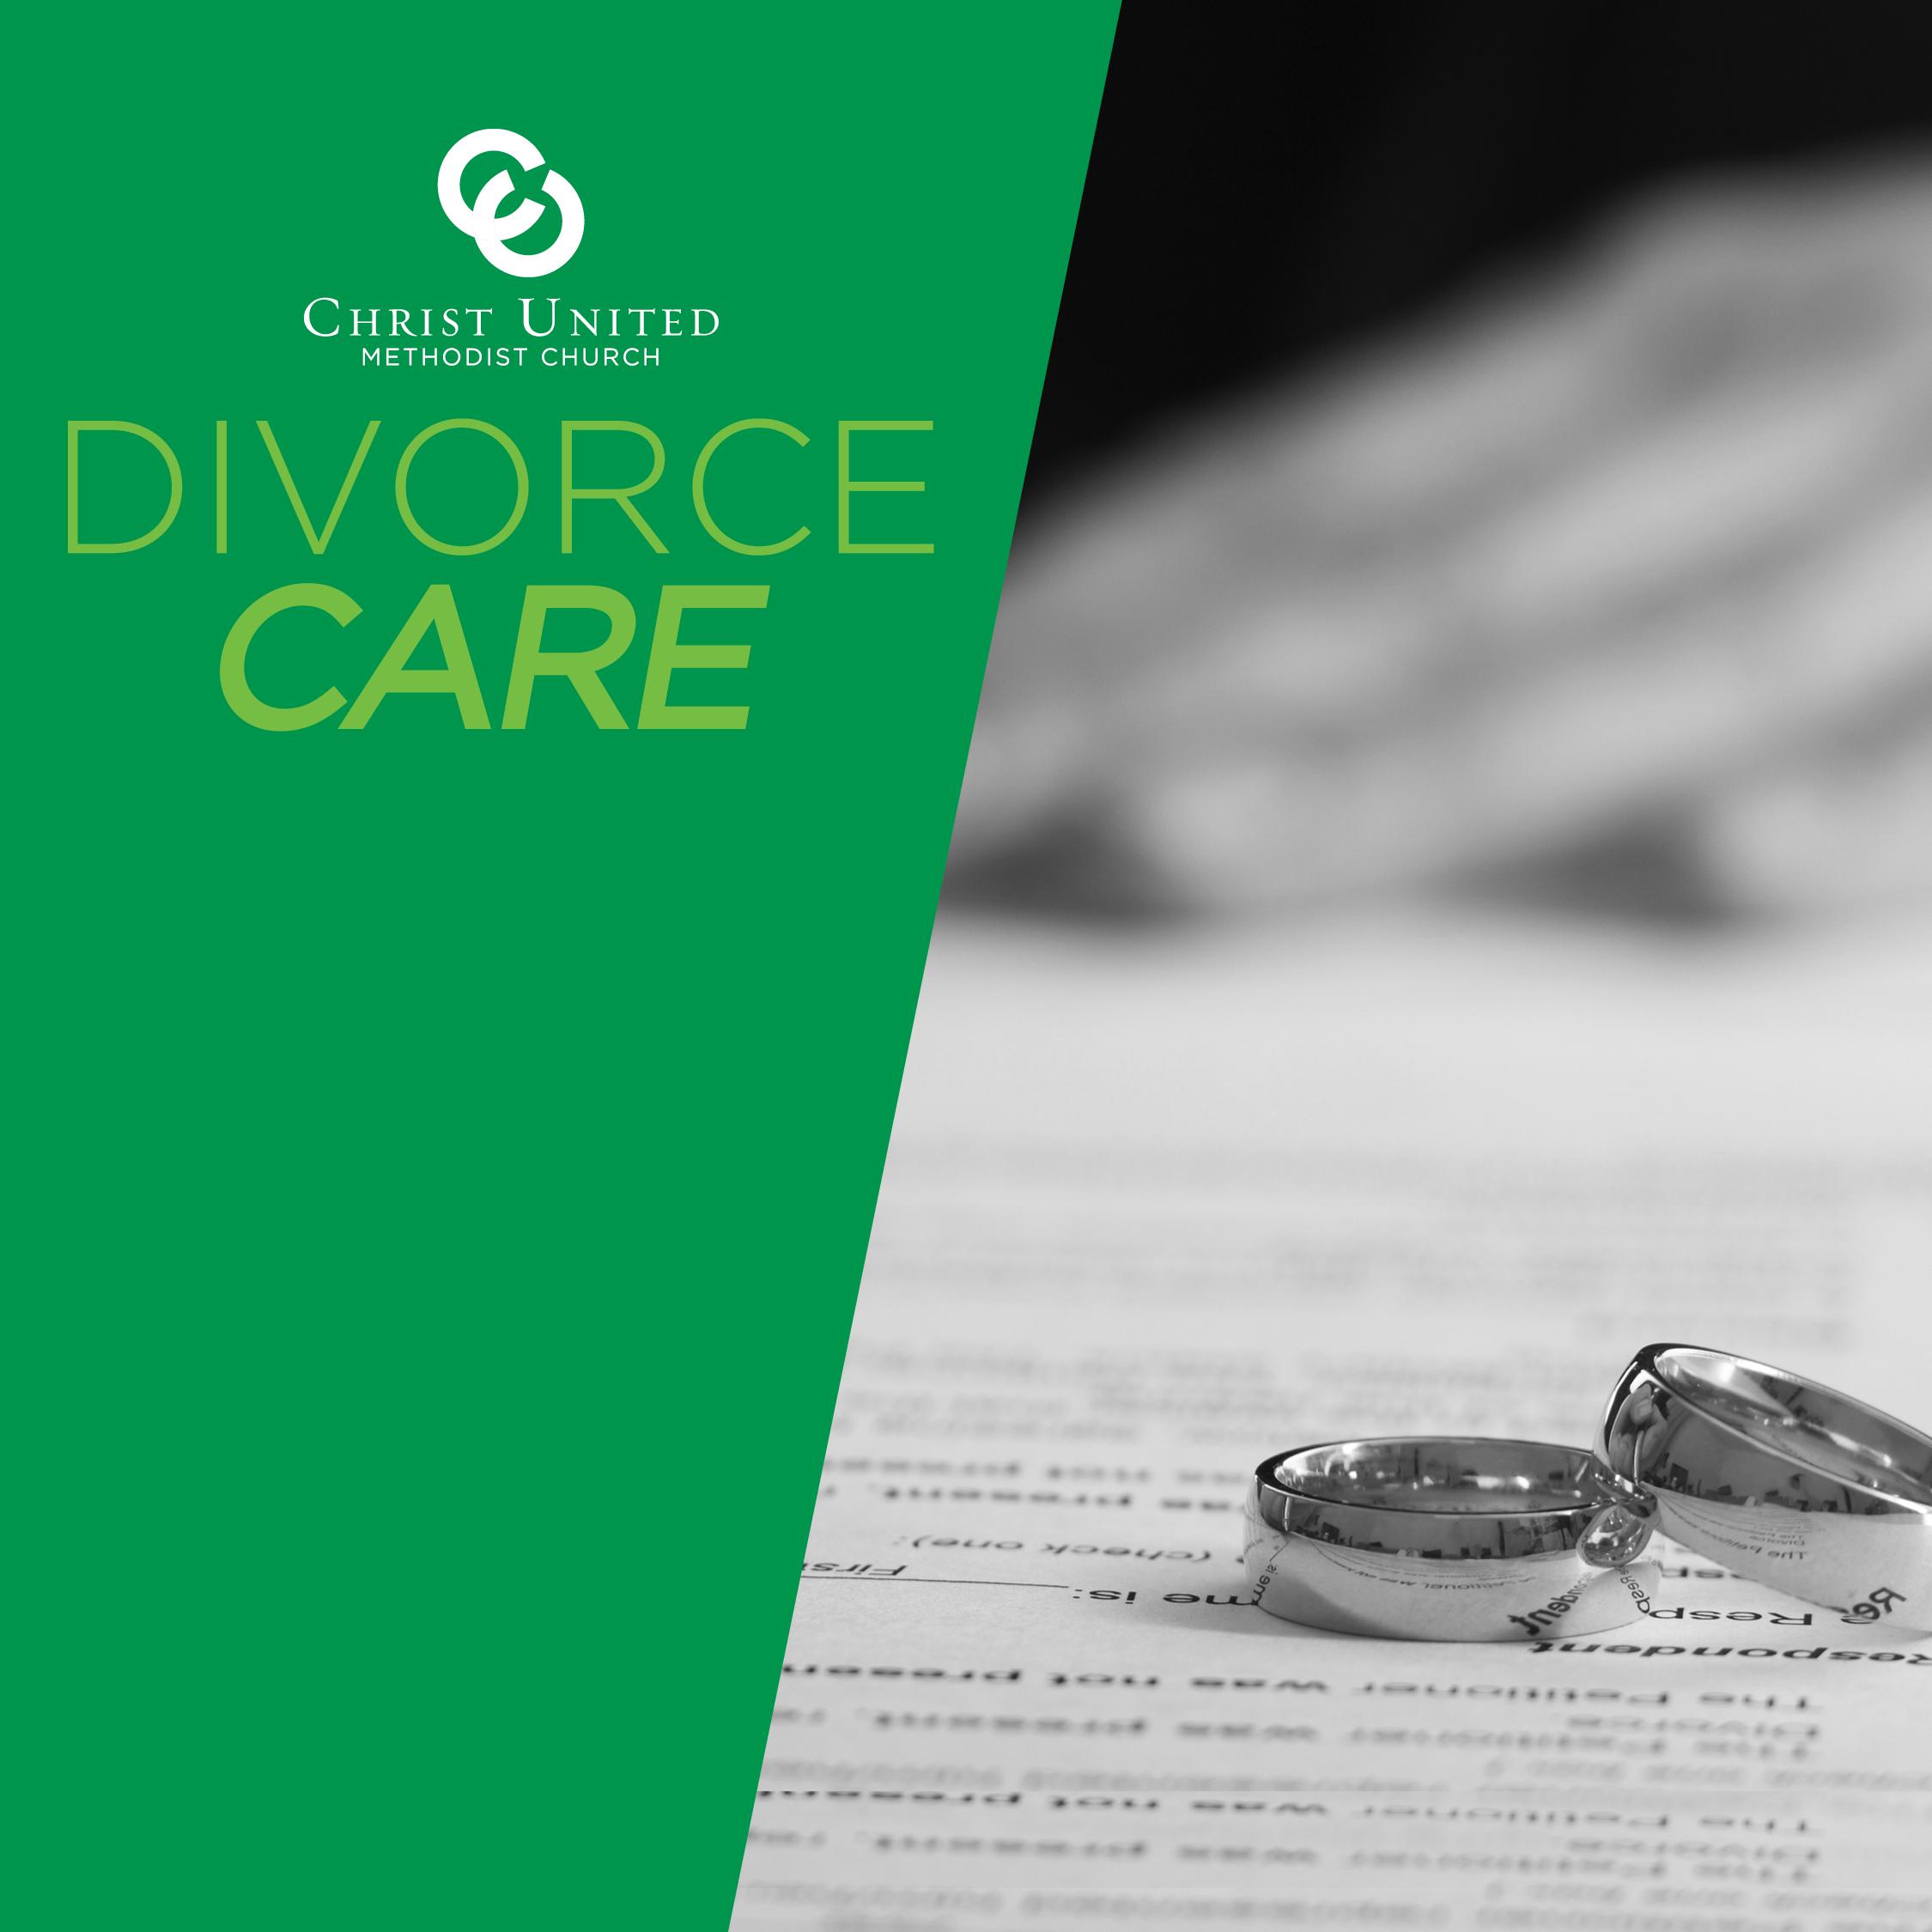 DivorceCareSQ.png